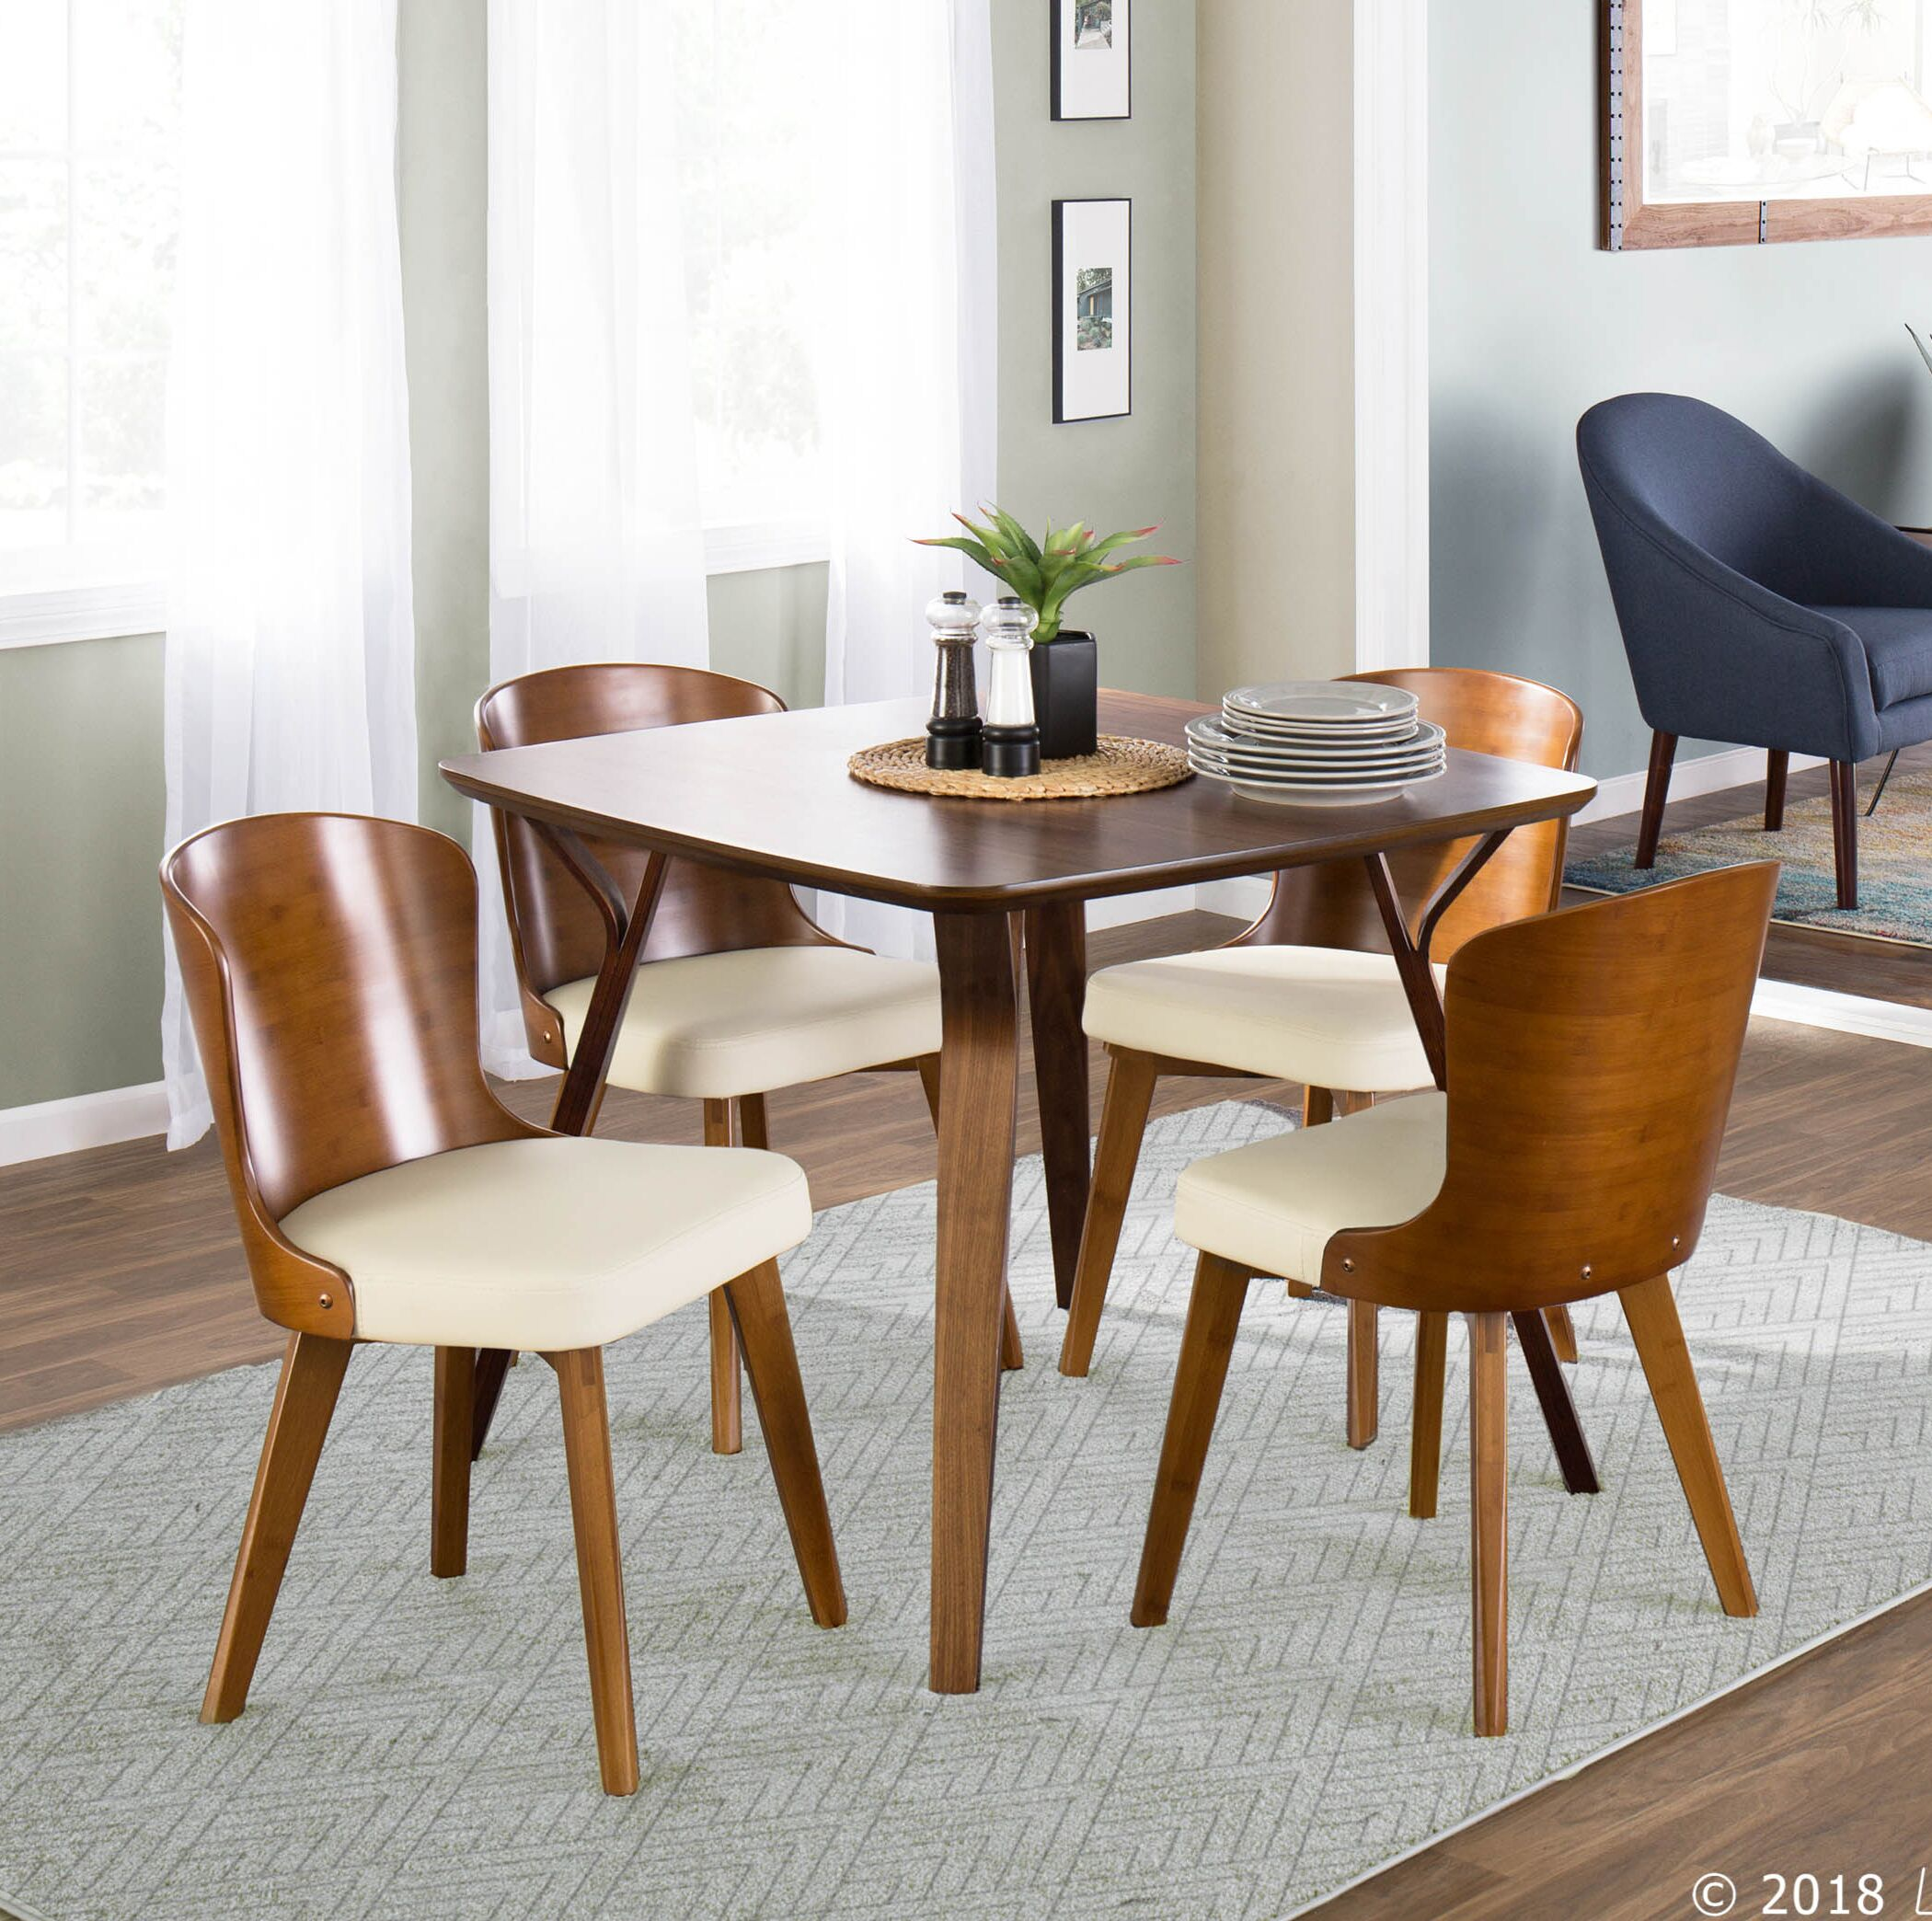 Kristofer Upholstered Dining Chair Upholstery Color: Cream